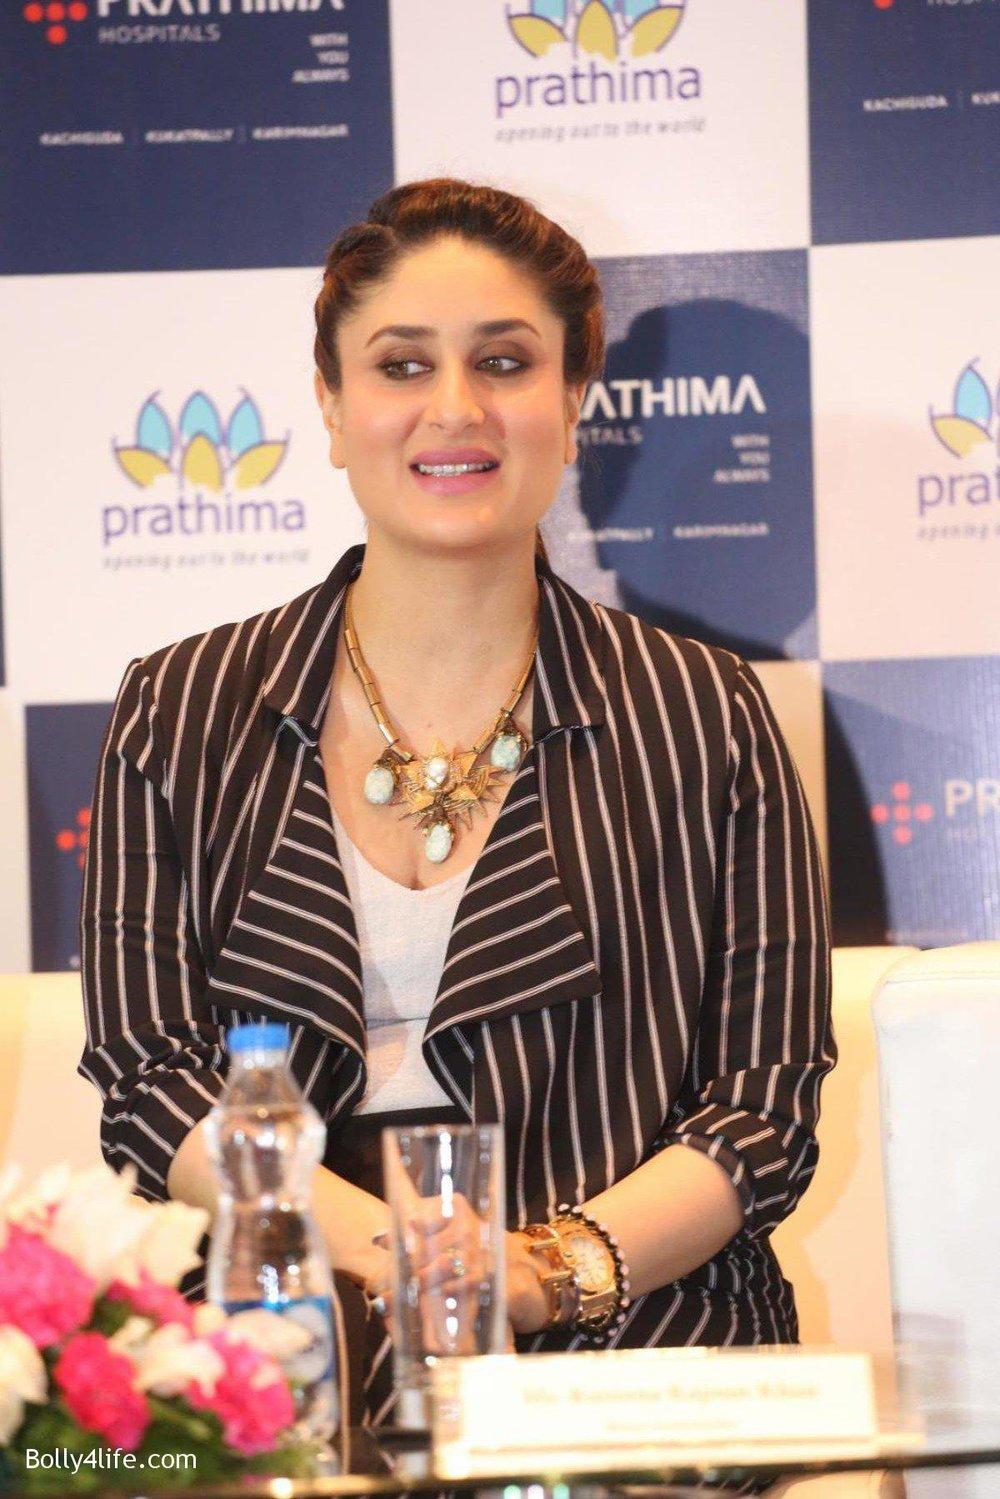 kareena-kapoor-prathima-hospitals-brand-ambassador-13.jpg